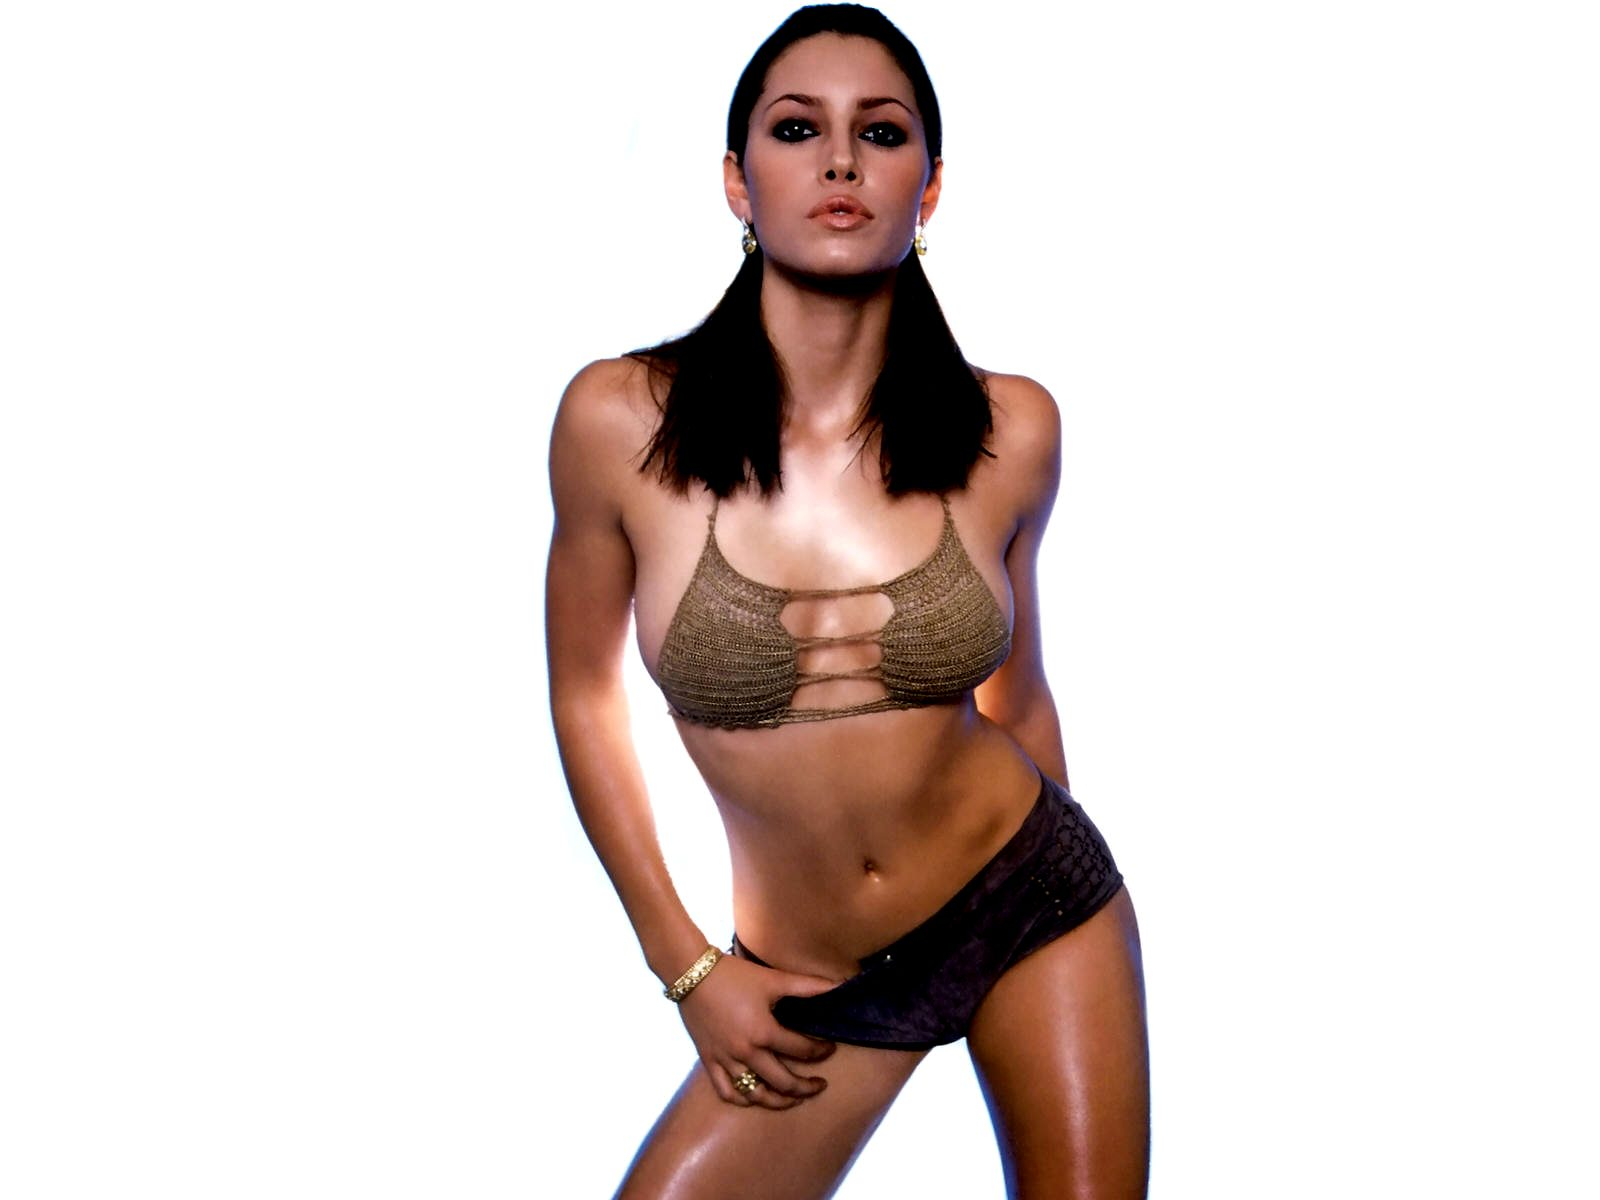 http://4.bp.blogspot.com/-ebfHu1dLm_s/T6JoxNs7WBI/AAAAAAAAJ_c/PRaiC7sMSe4/s1600/2730-celebrity_jessica_biel_wallpaper.jpg